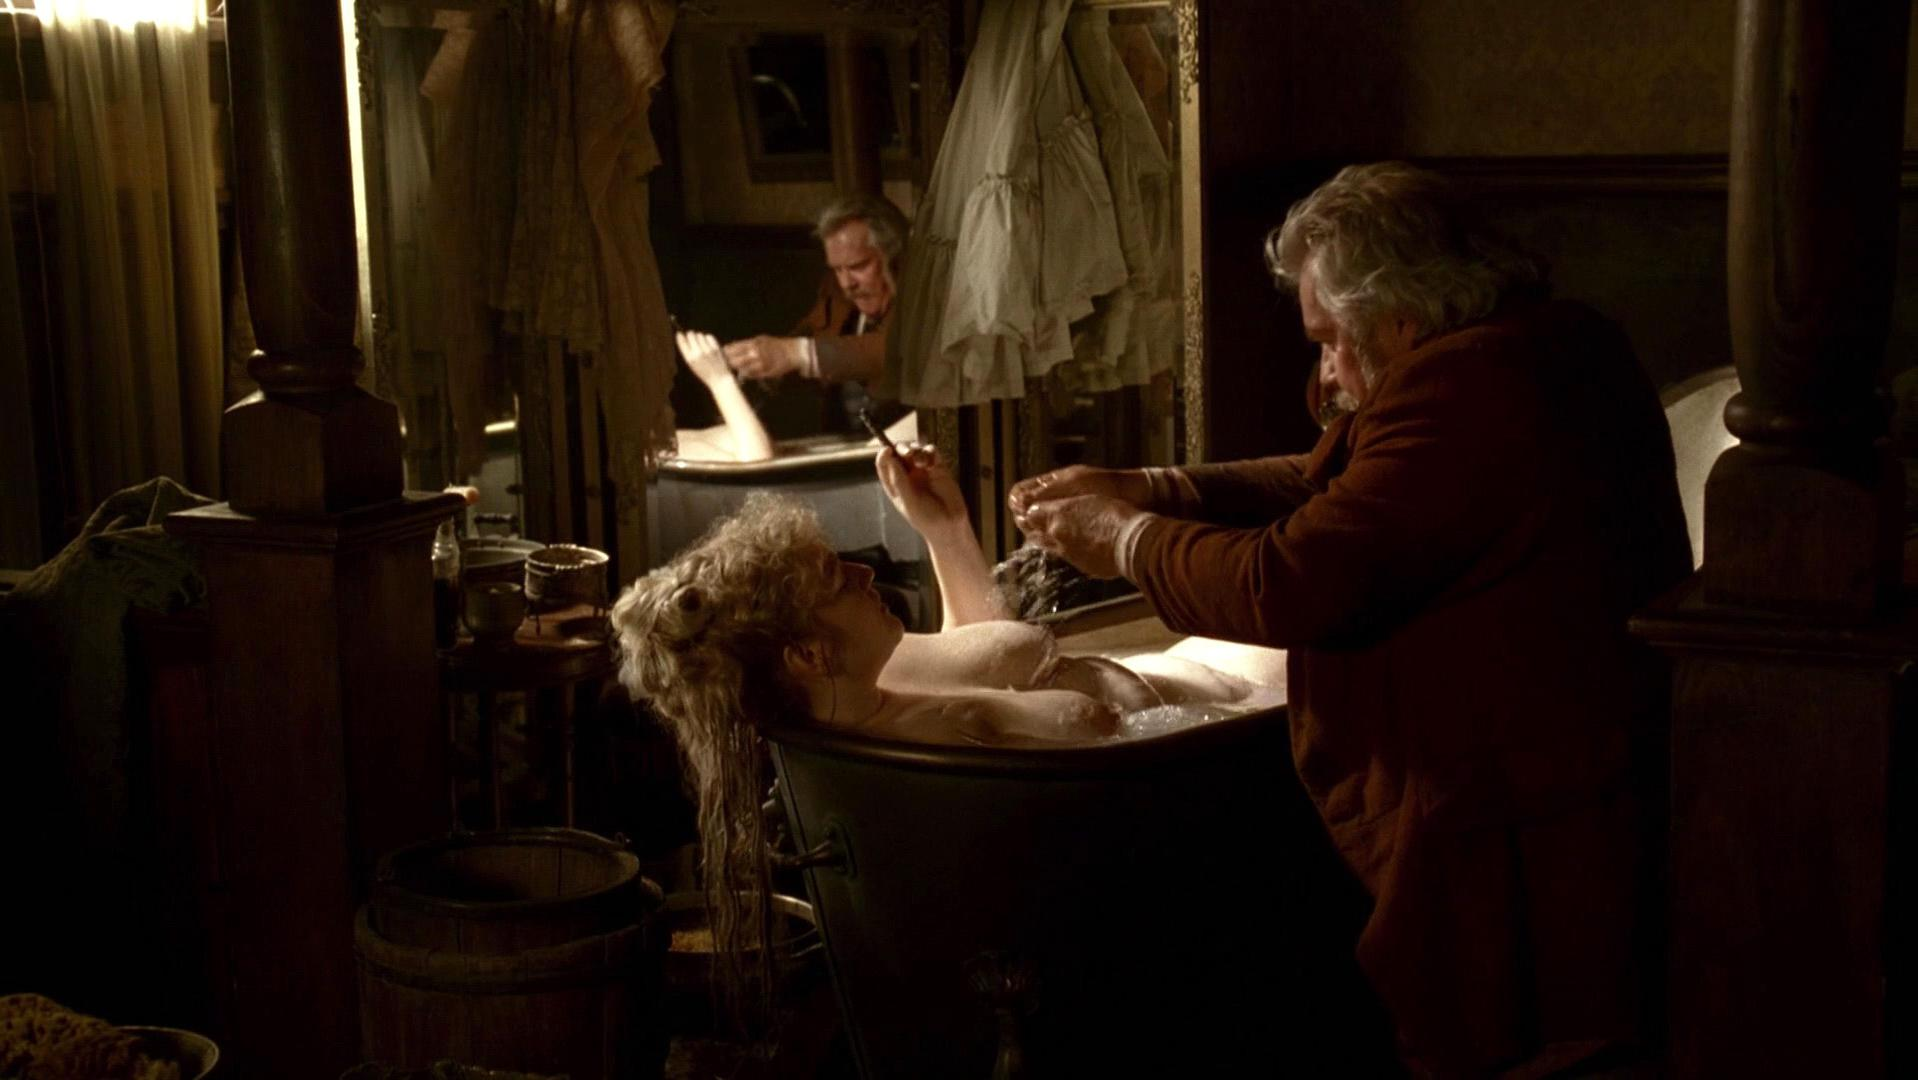 Sarah B. Lund nude - Deadwood s03e05 (2006)